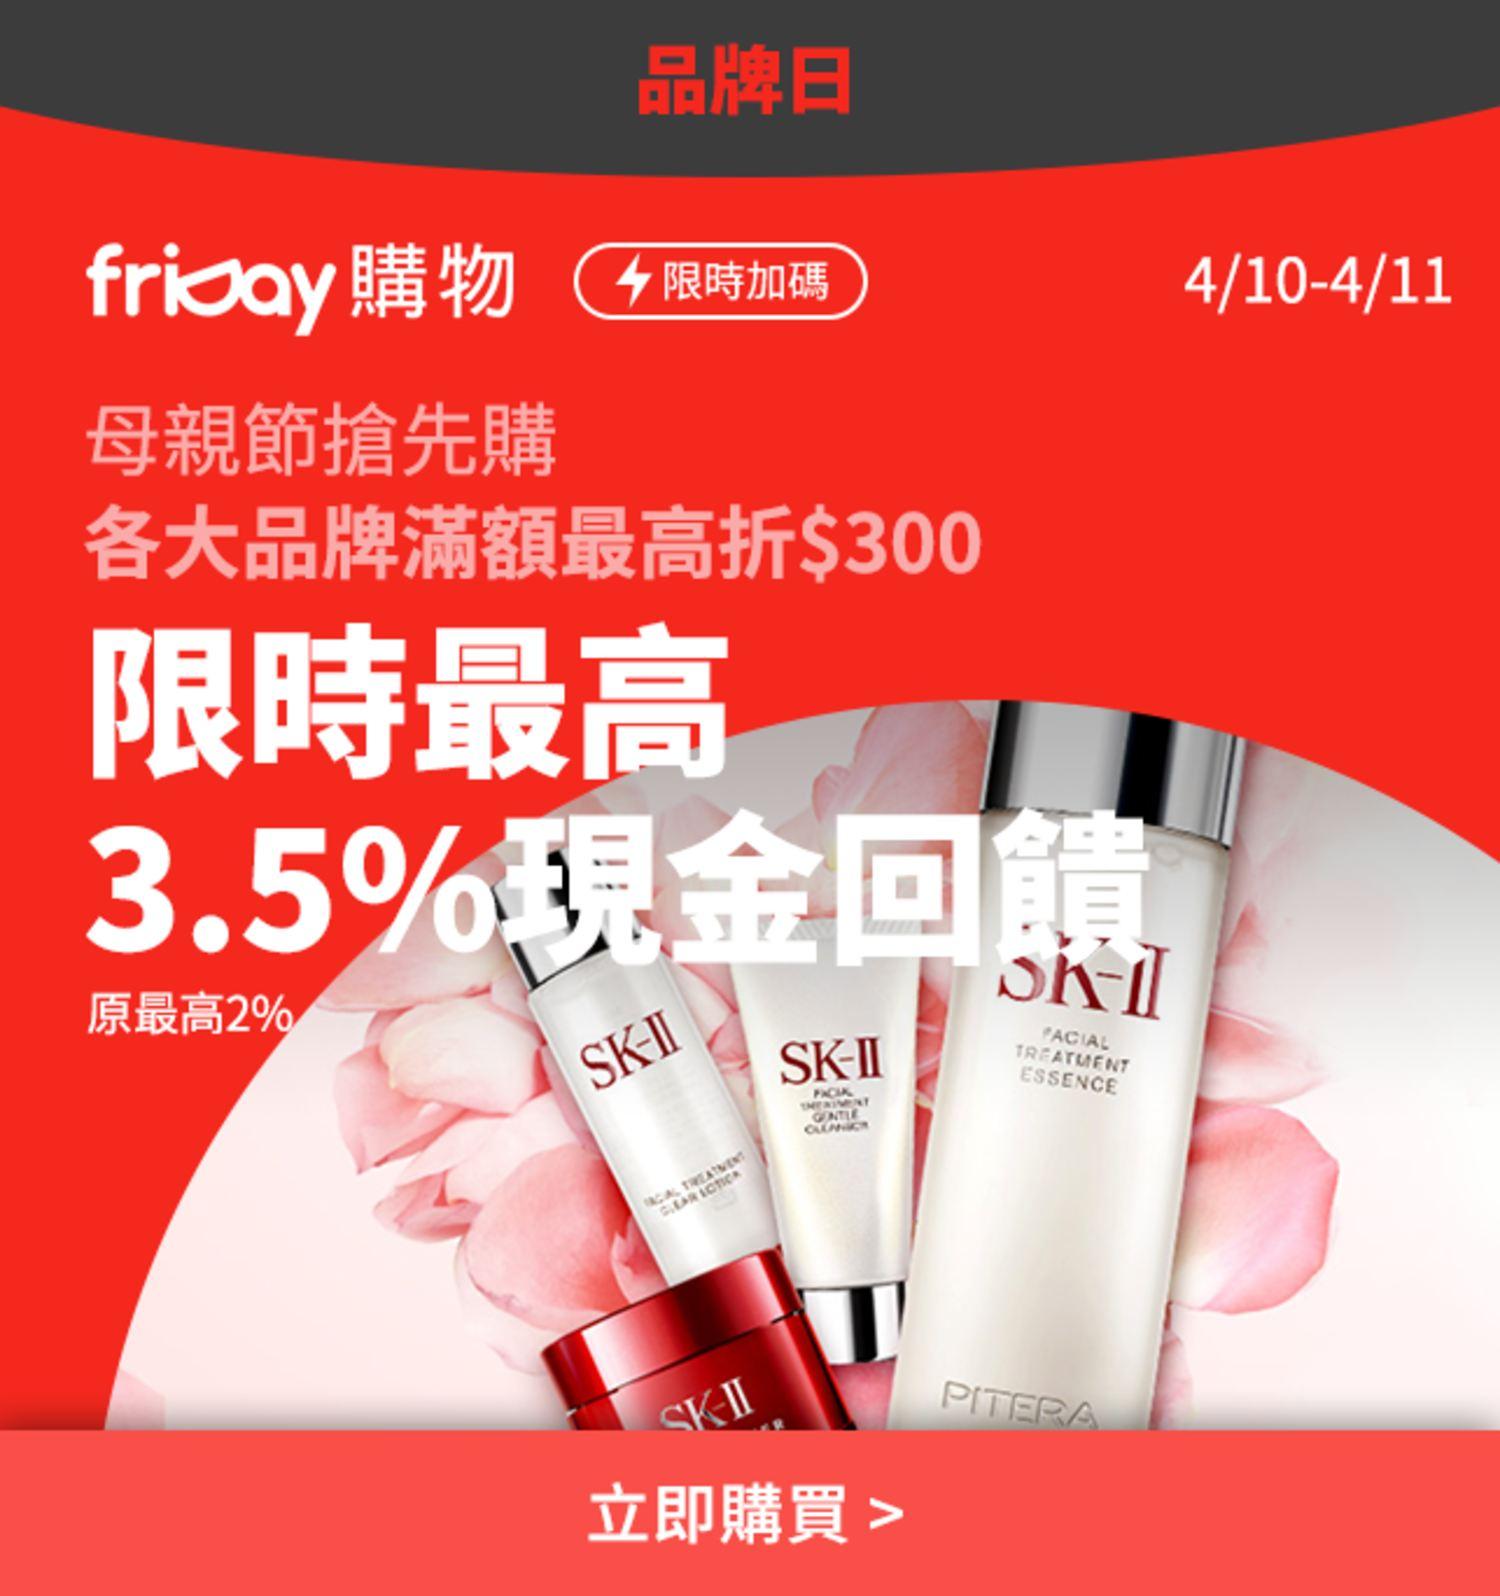 friDay購物 4/10-4/11